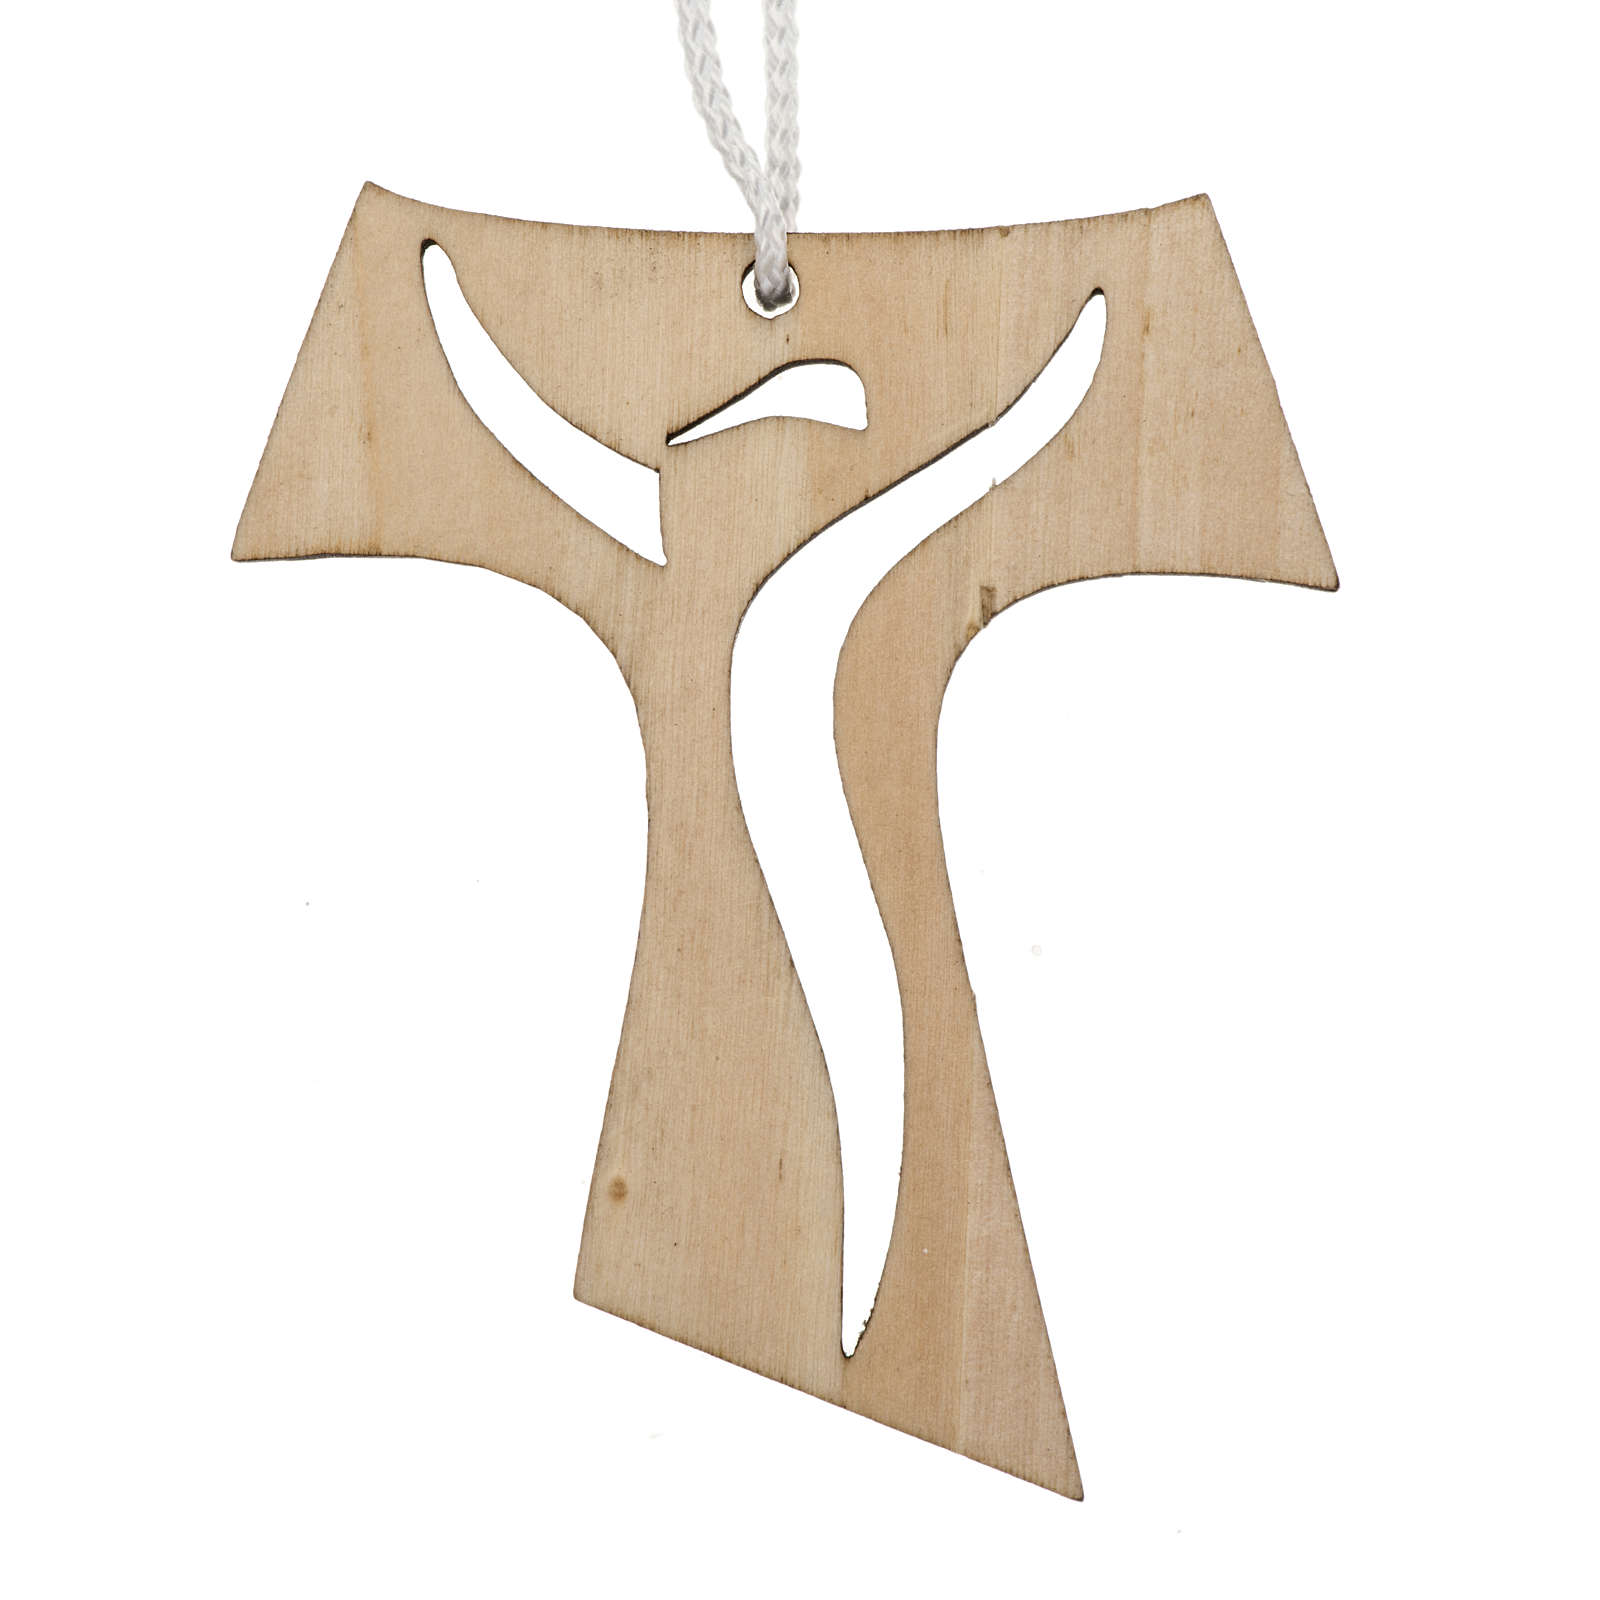 Cruz Primera Comunión madera tallada 9.3x8cm 4